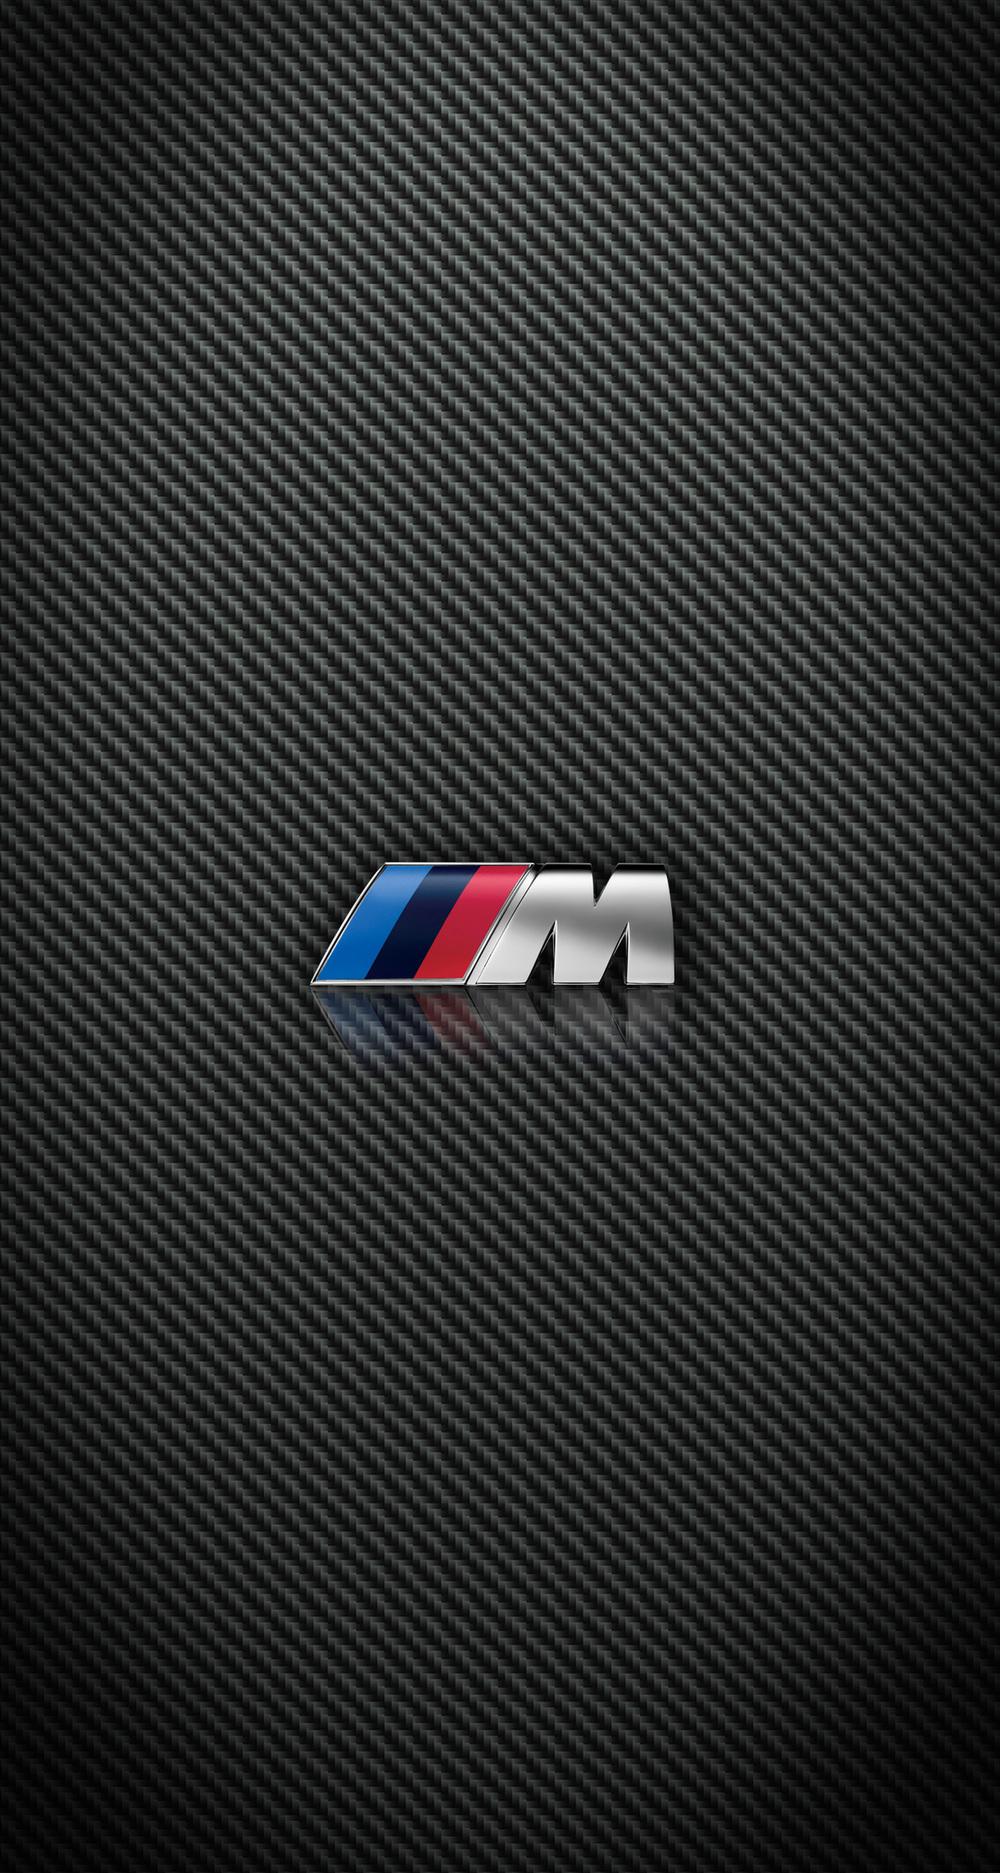 Audi logo hd wallpaper for iphone 6s plus 13